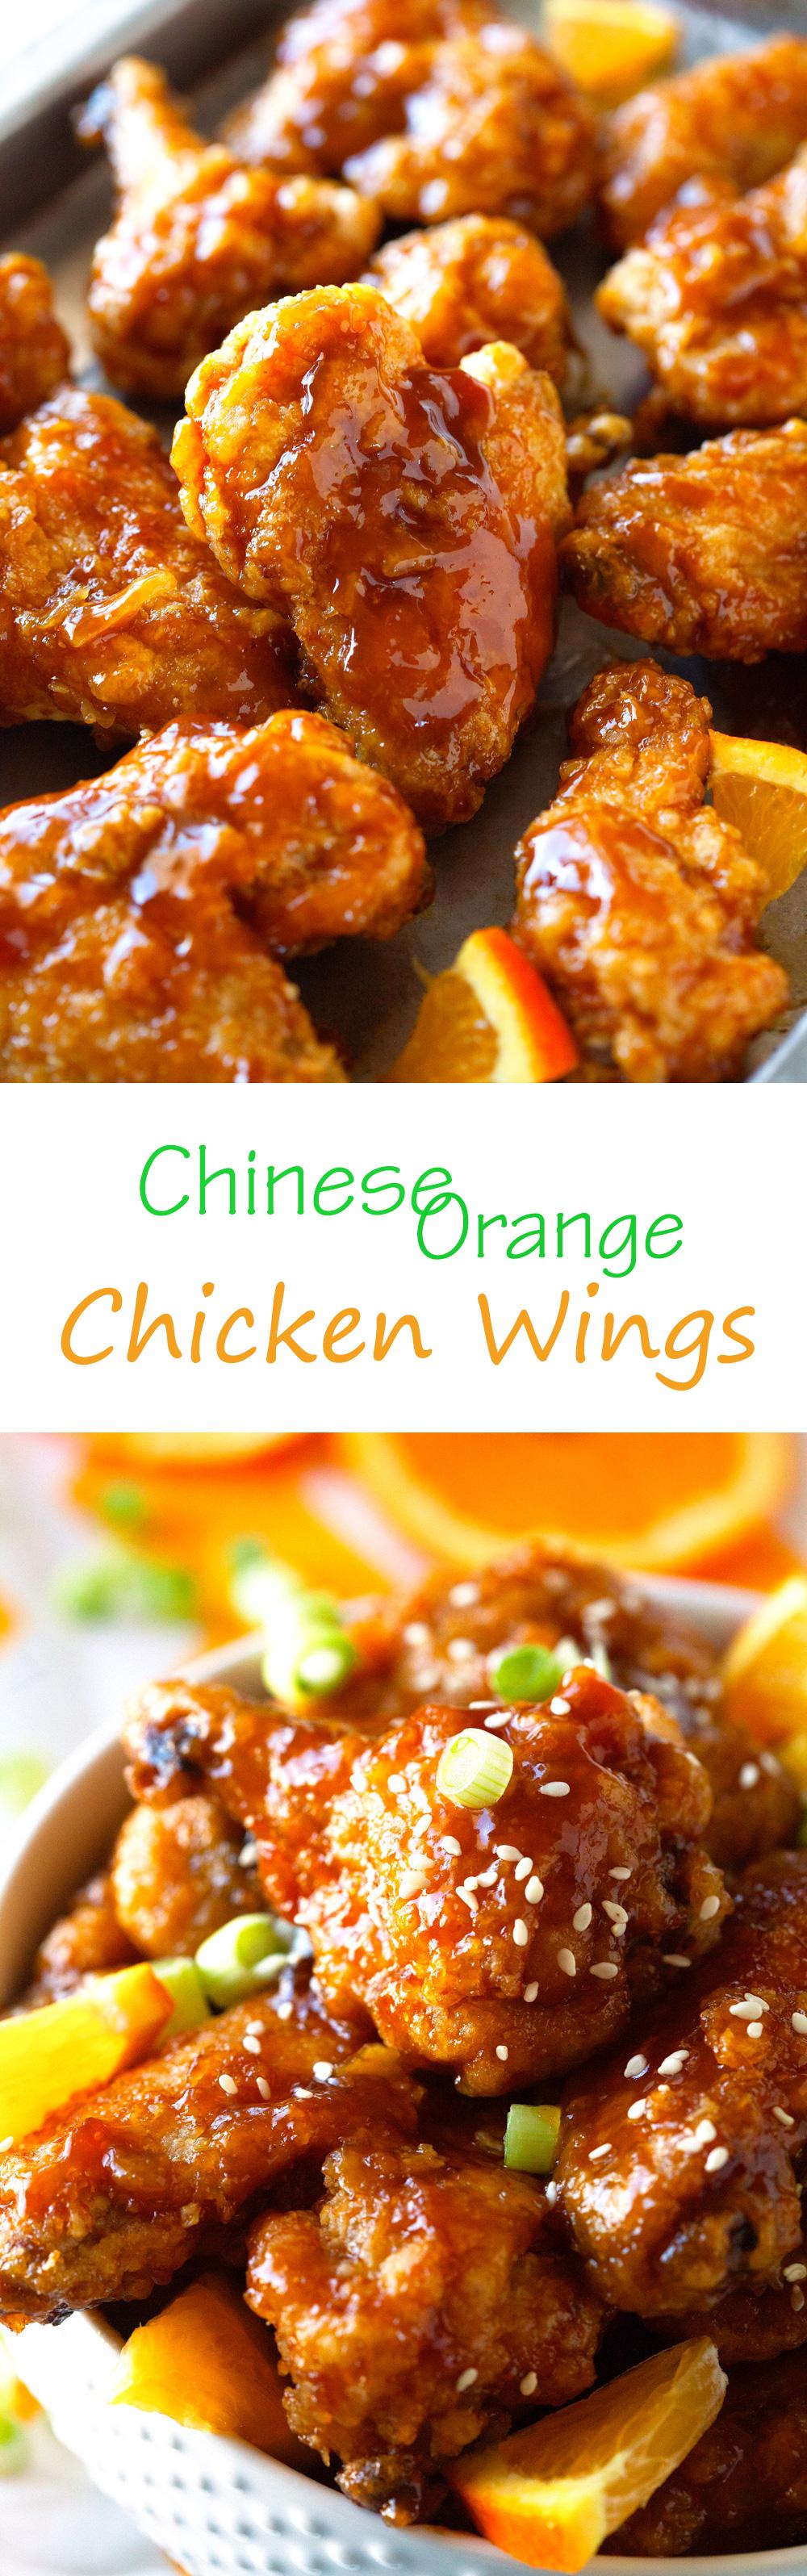 Chinese orange chicken wings forumfinder Choice Image